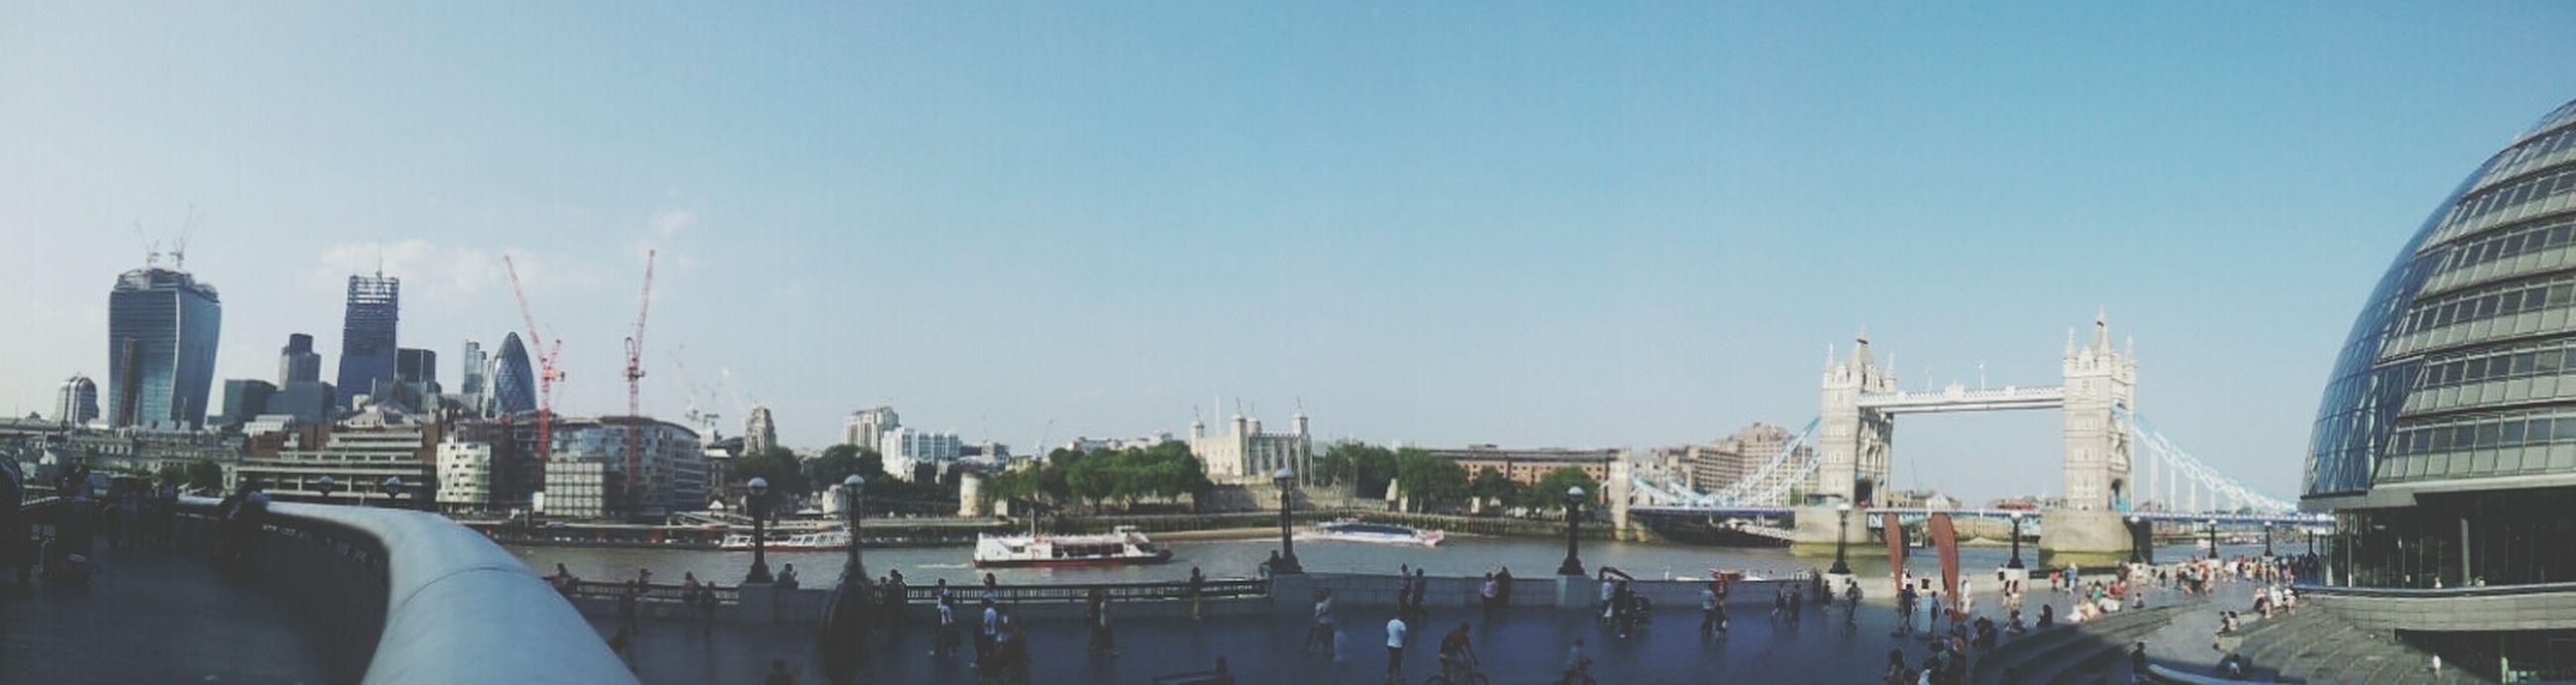 London Tower Bridge  Miss It Panorámica